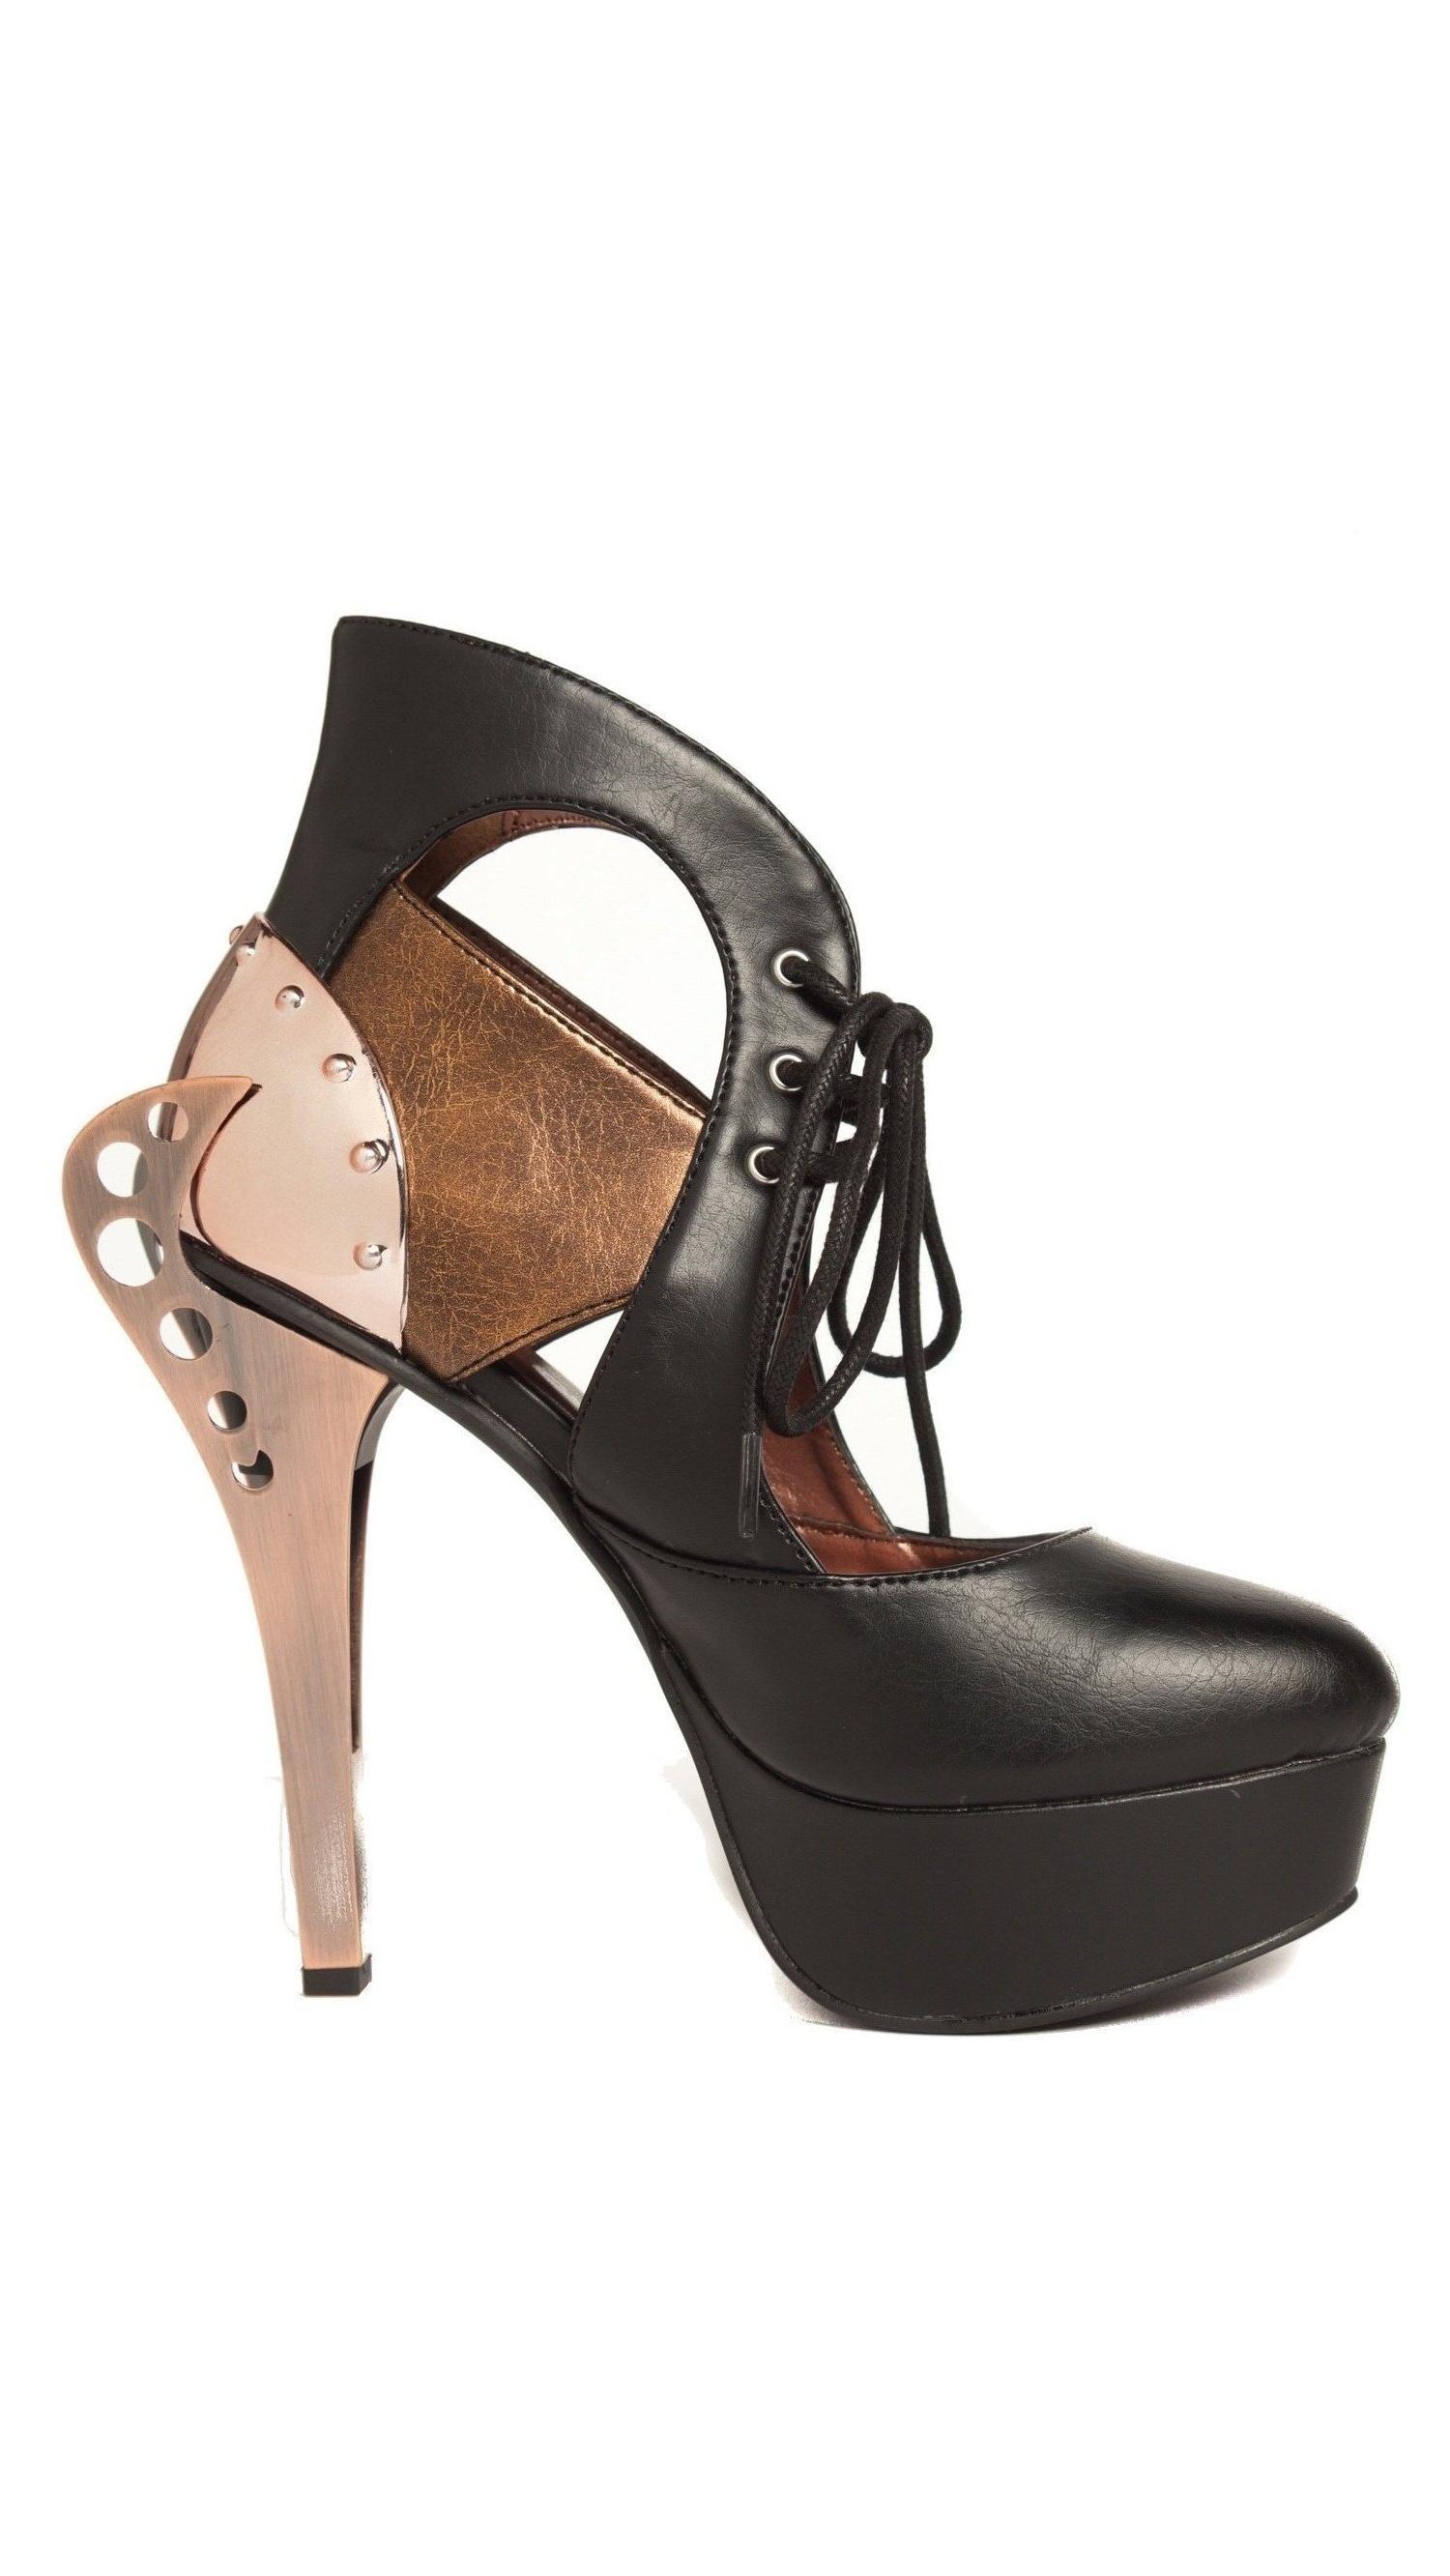 Hades Shoes sandals H-ASMARA 1 platform two toned sandals Shoes 11 / Black 5f5dbe